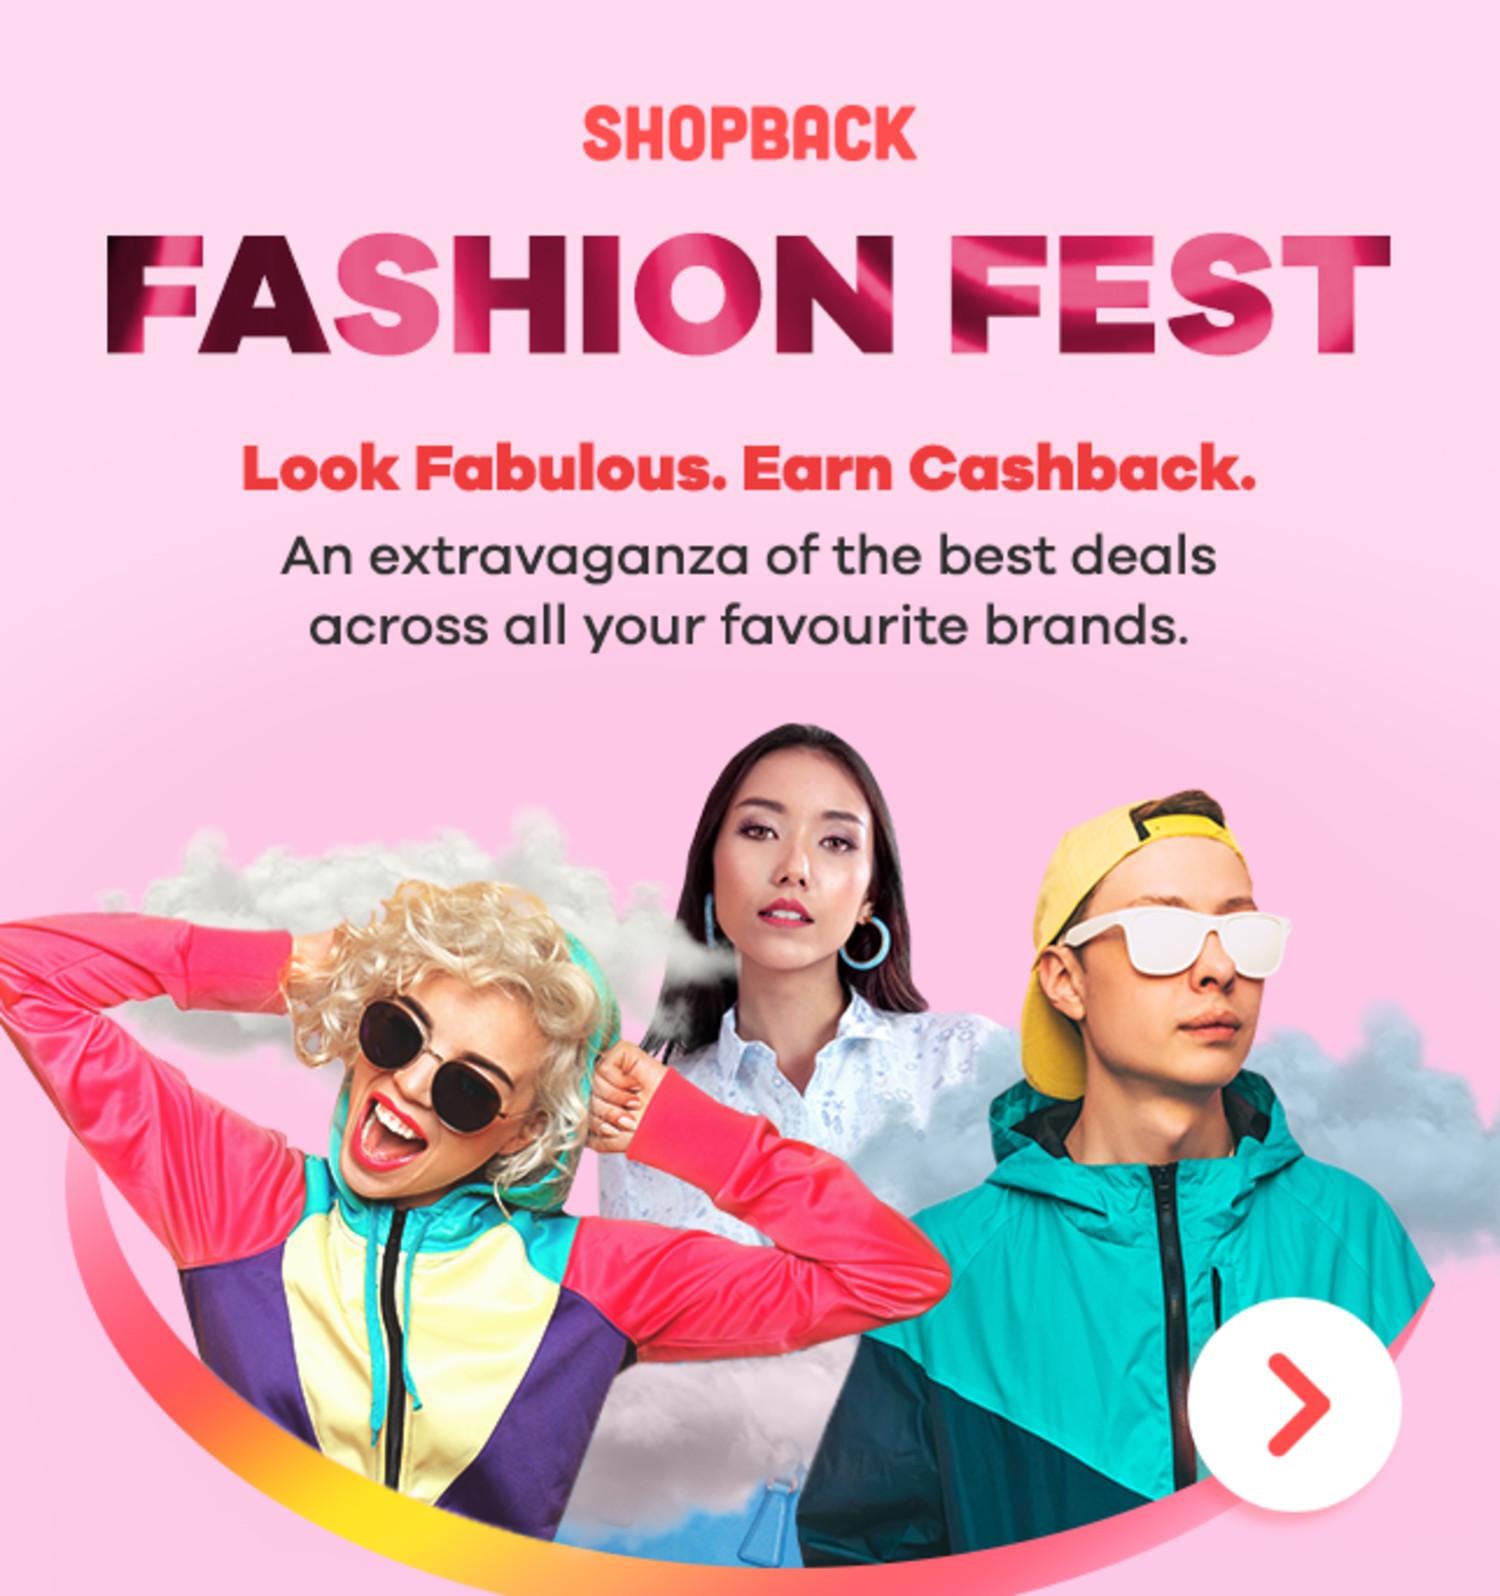 ShopBack - Fashion Fest - Look Fabulous and Earn CashBack